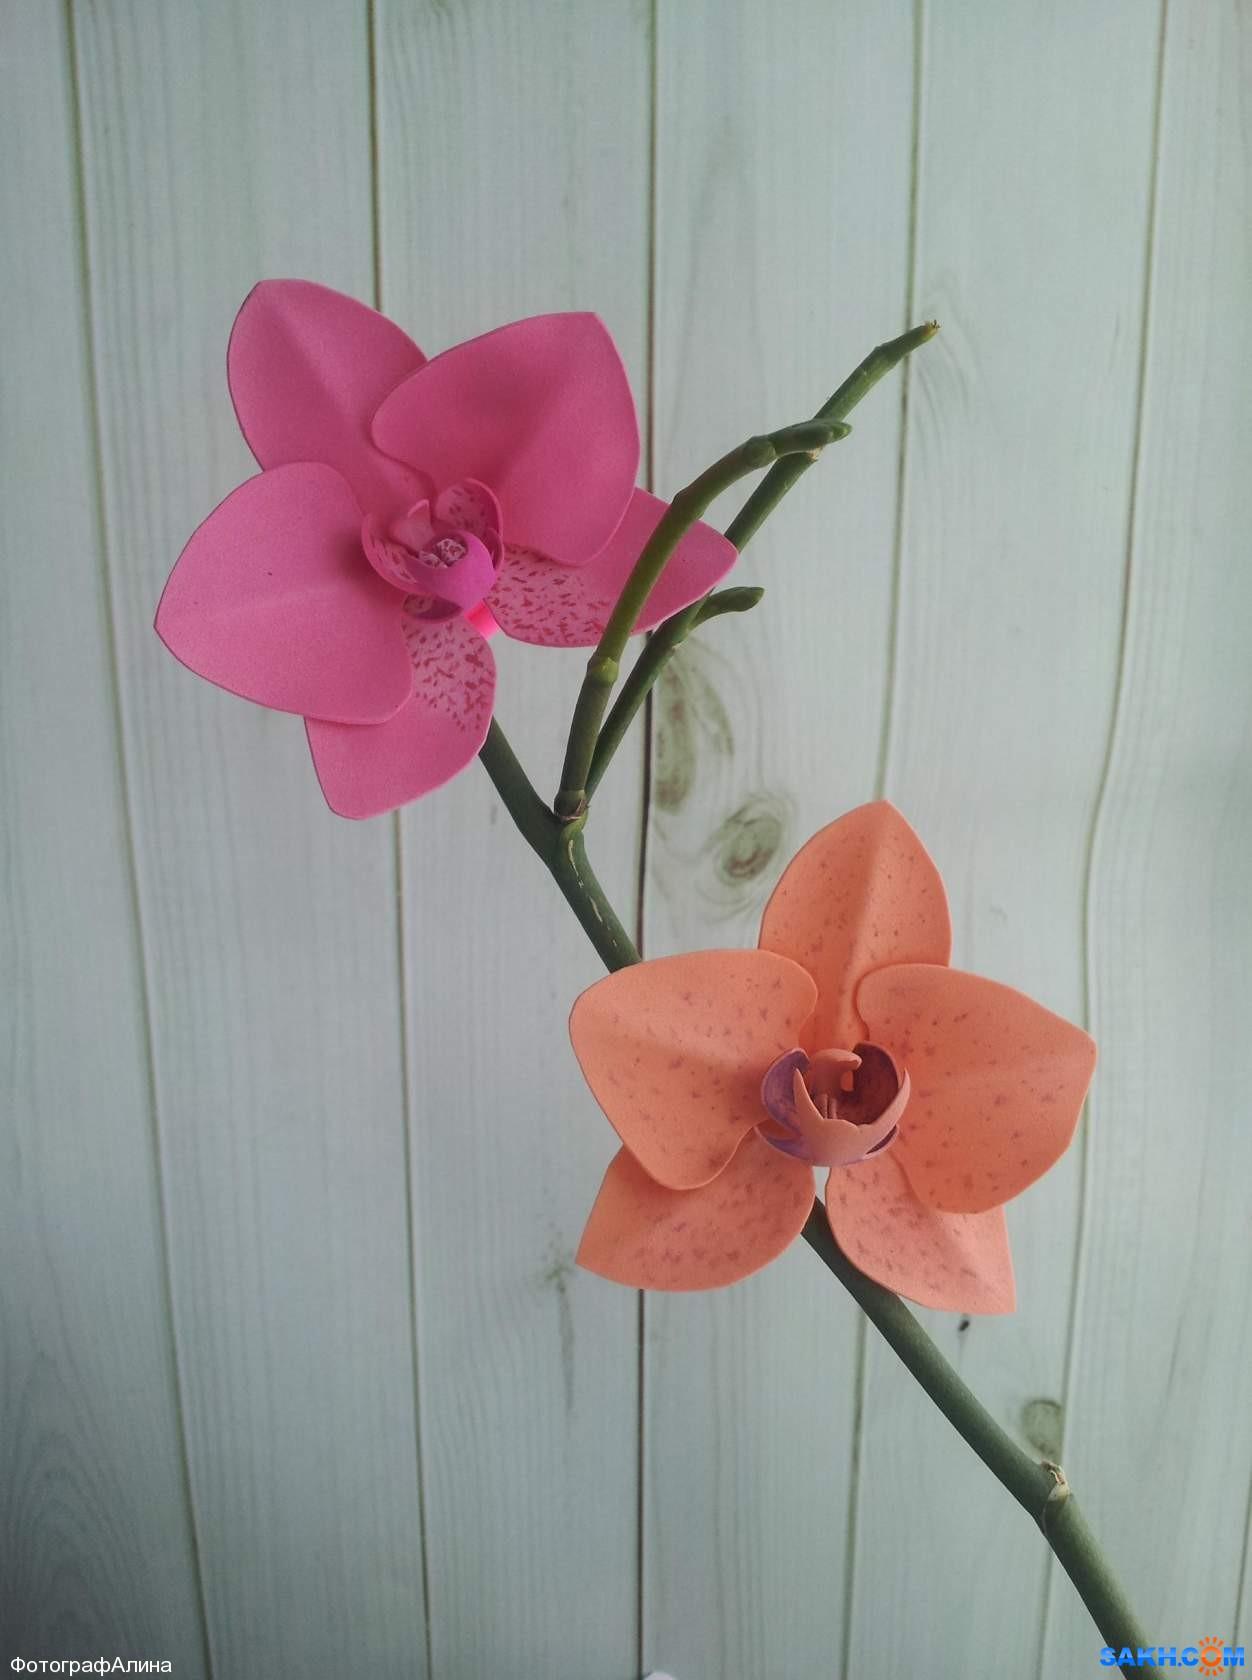 ФотографАлина: резинки орхидея